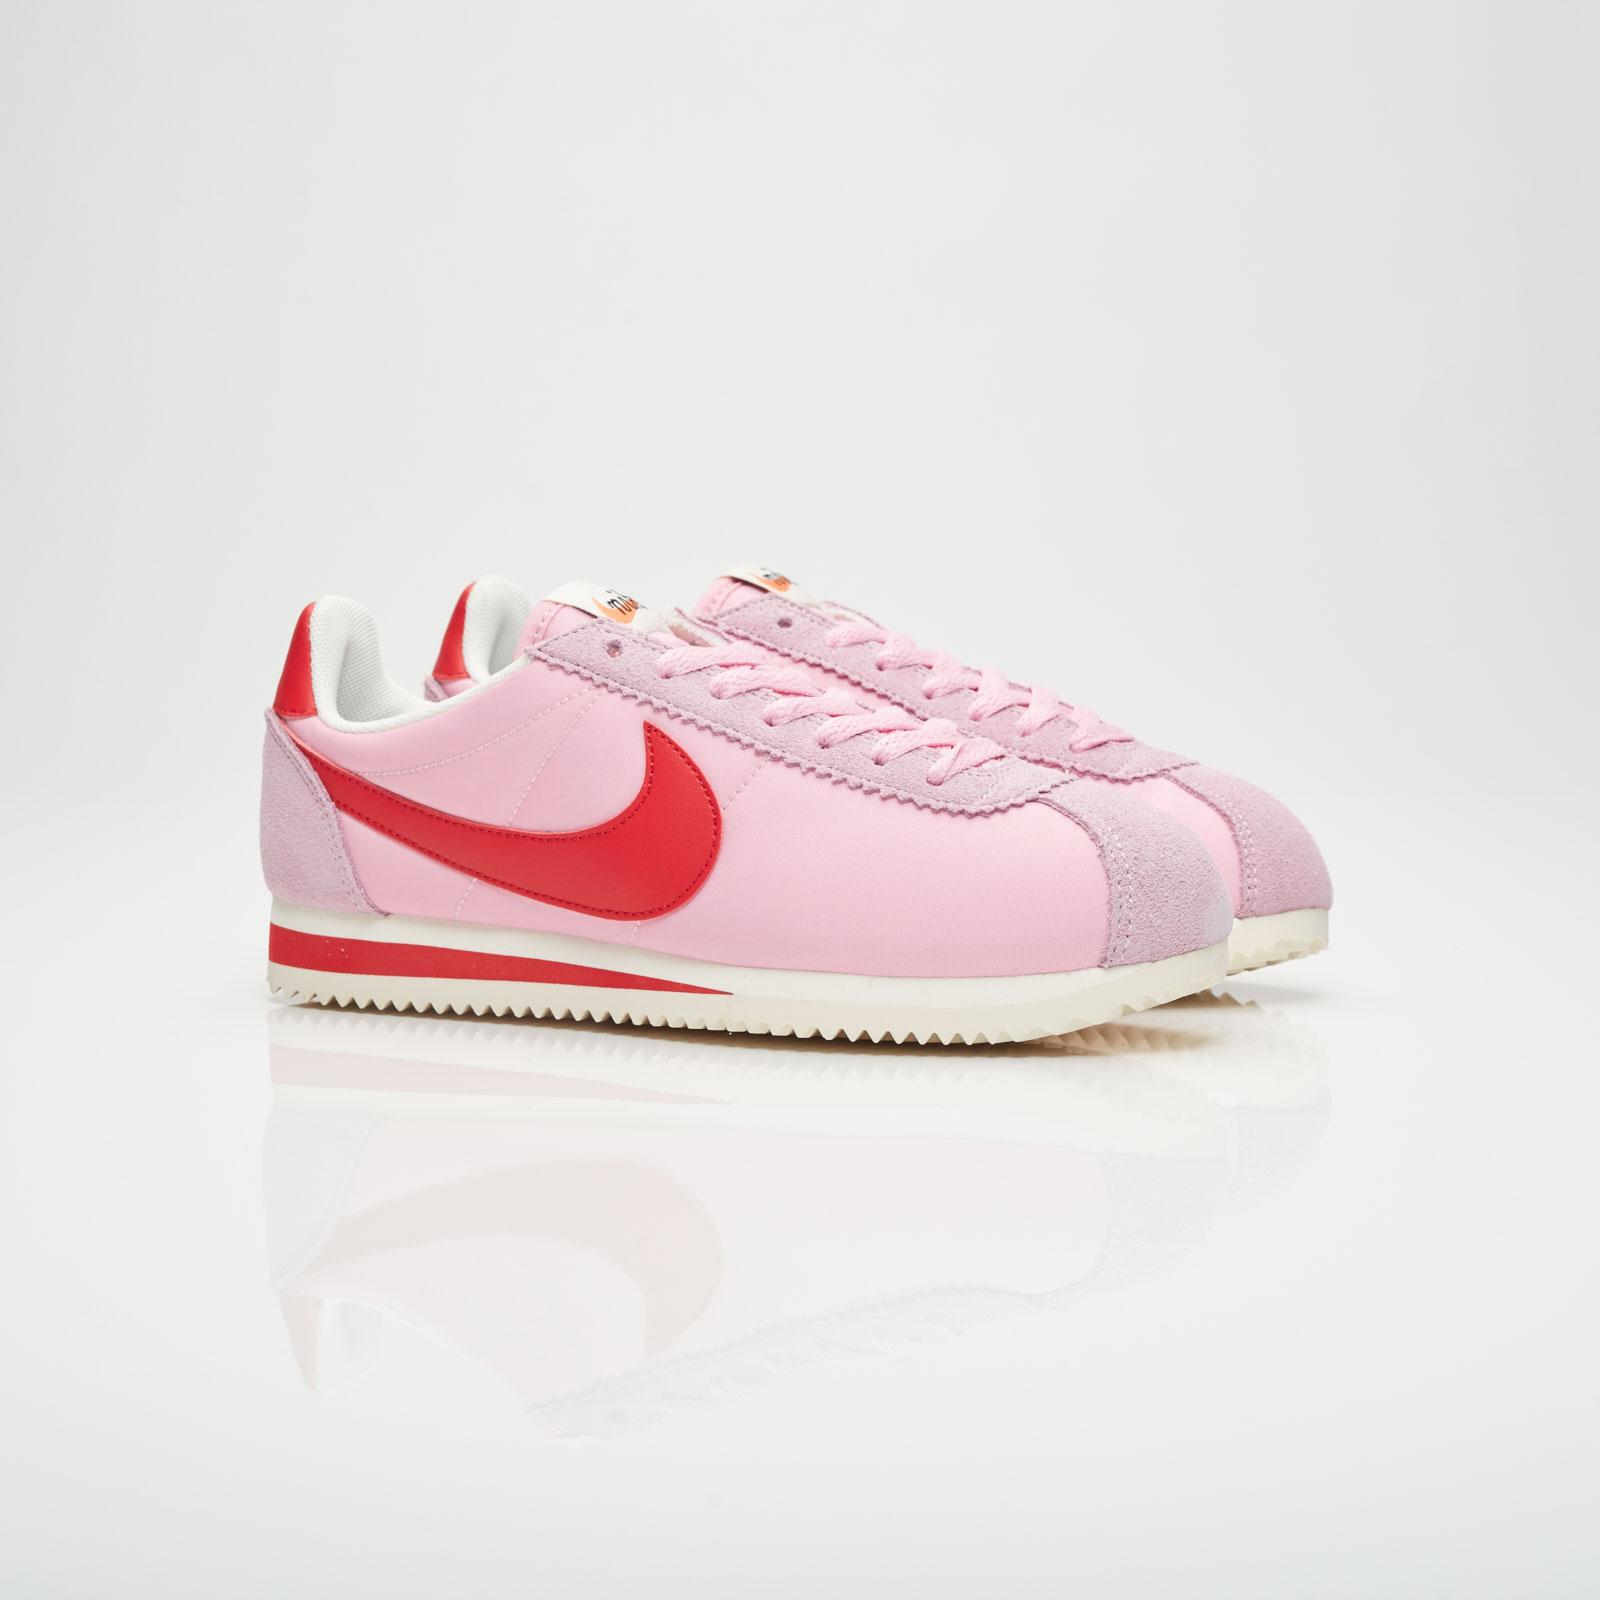 online retailer 06ccc 354ee Nike Wmns Classic Cortez Nylon Premium - 882258-601 ...